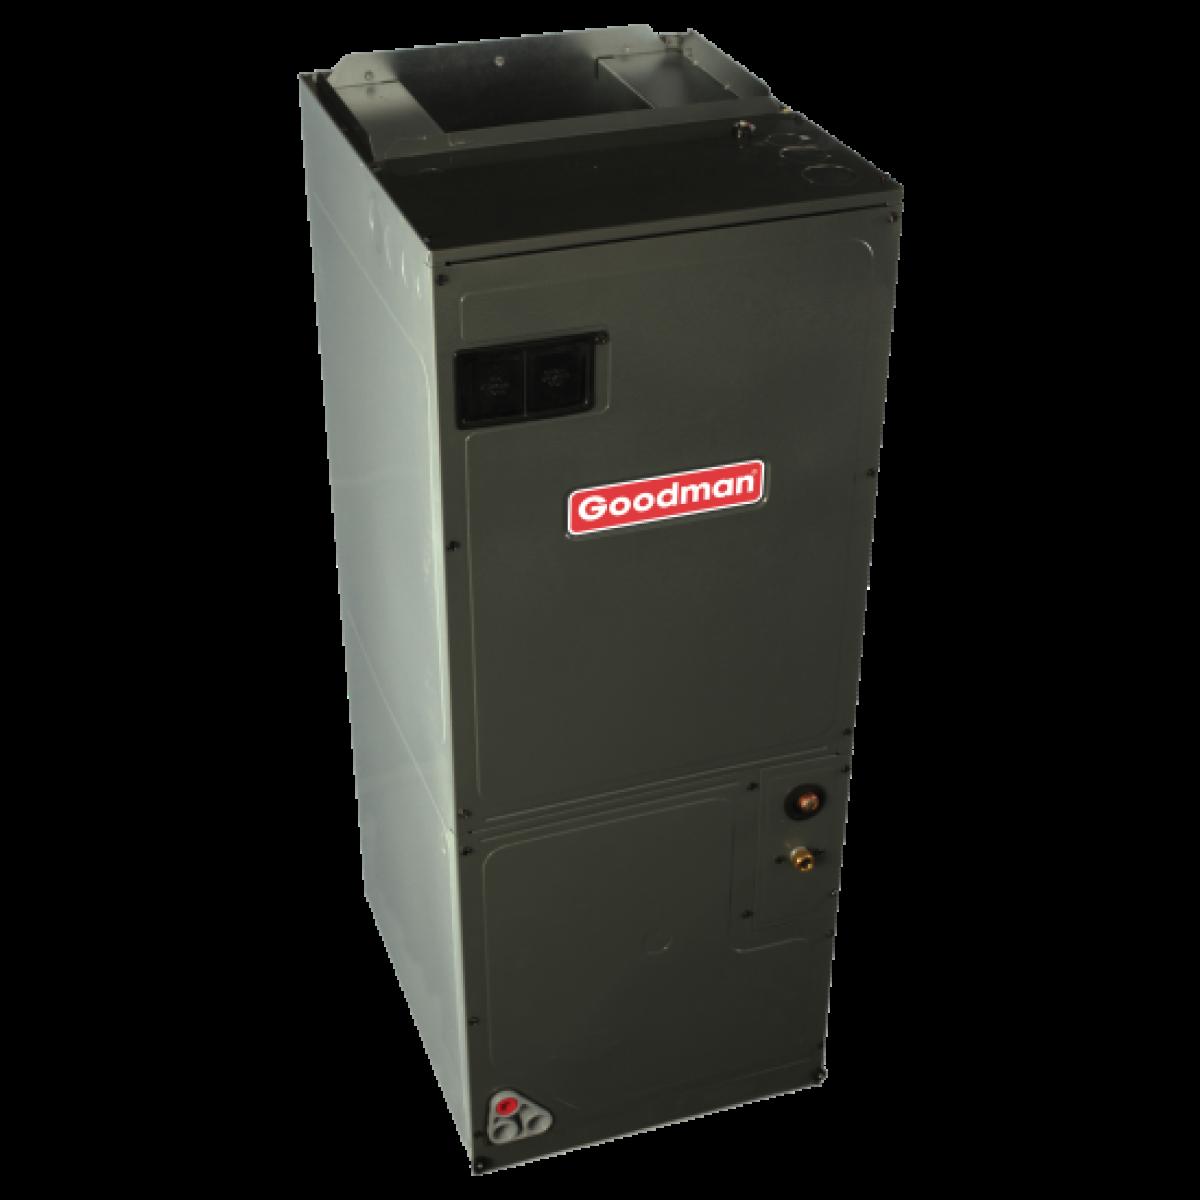 Goodman 14 Seer 1 5 Ton Electric Heat Split System 1 5